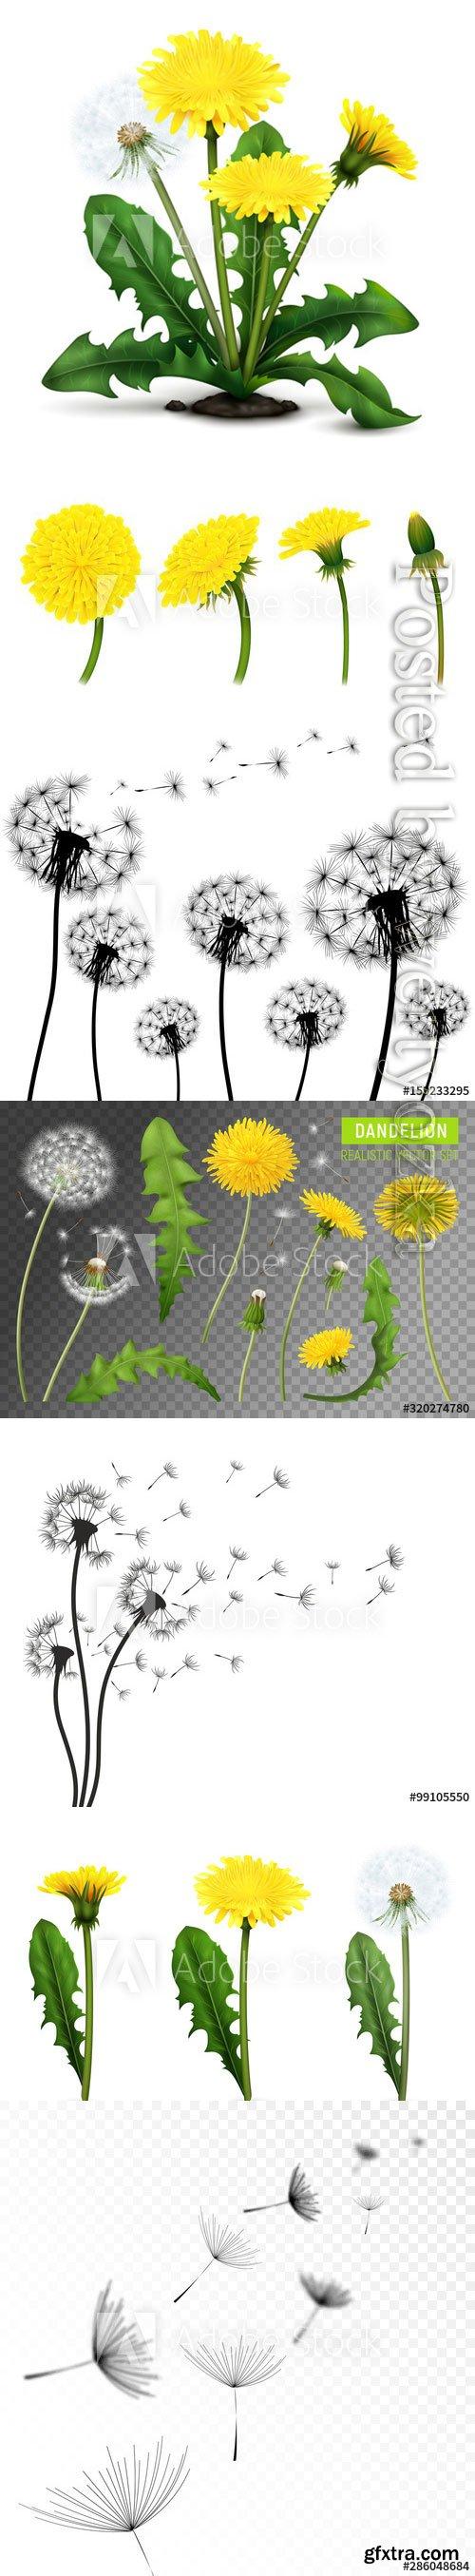 Dandelions vector illustrations